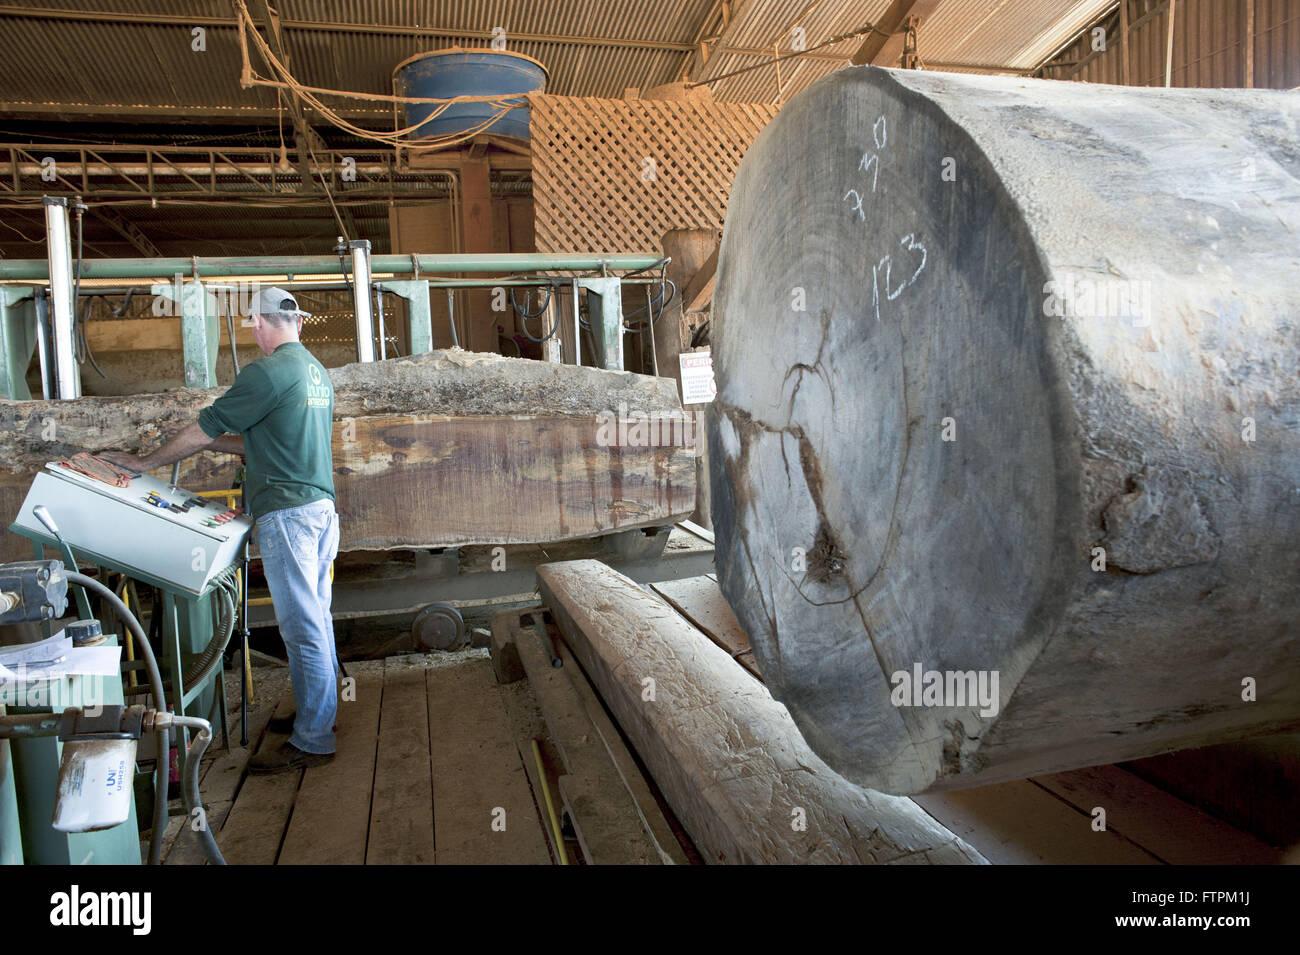 Cumaru Tree Logs Iron To Cut Sawmill Certified Wood Stock Photo